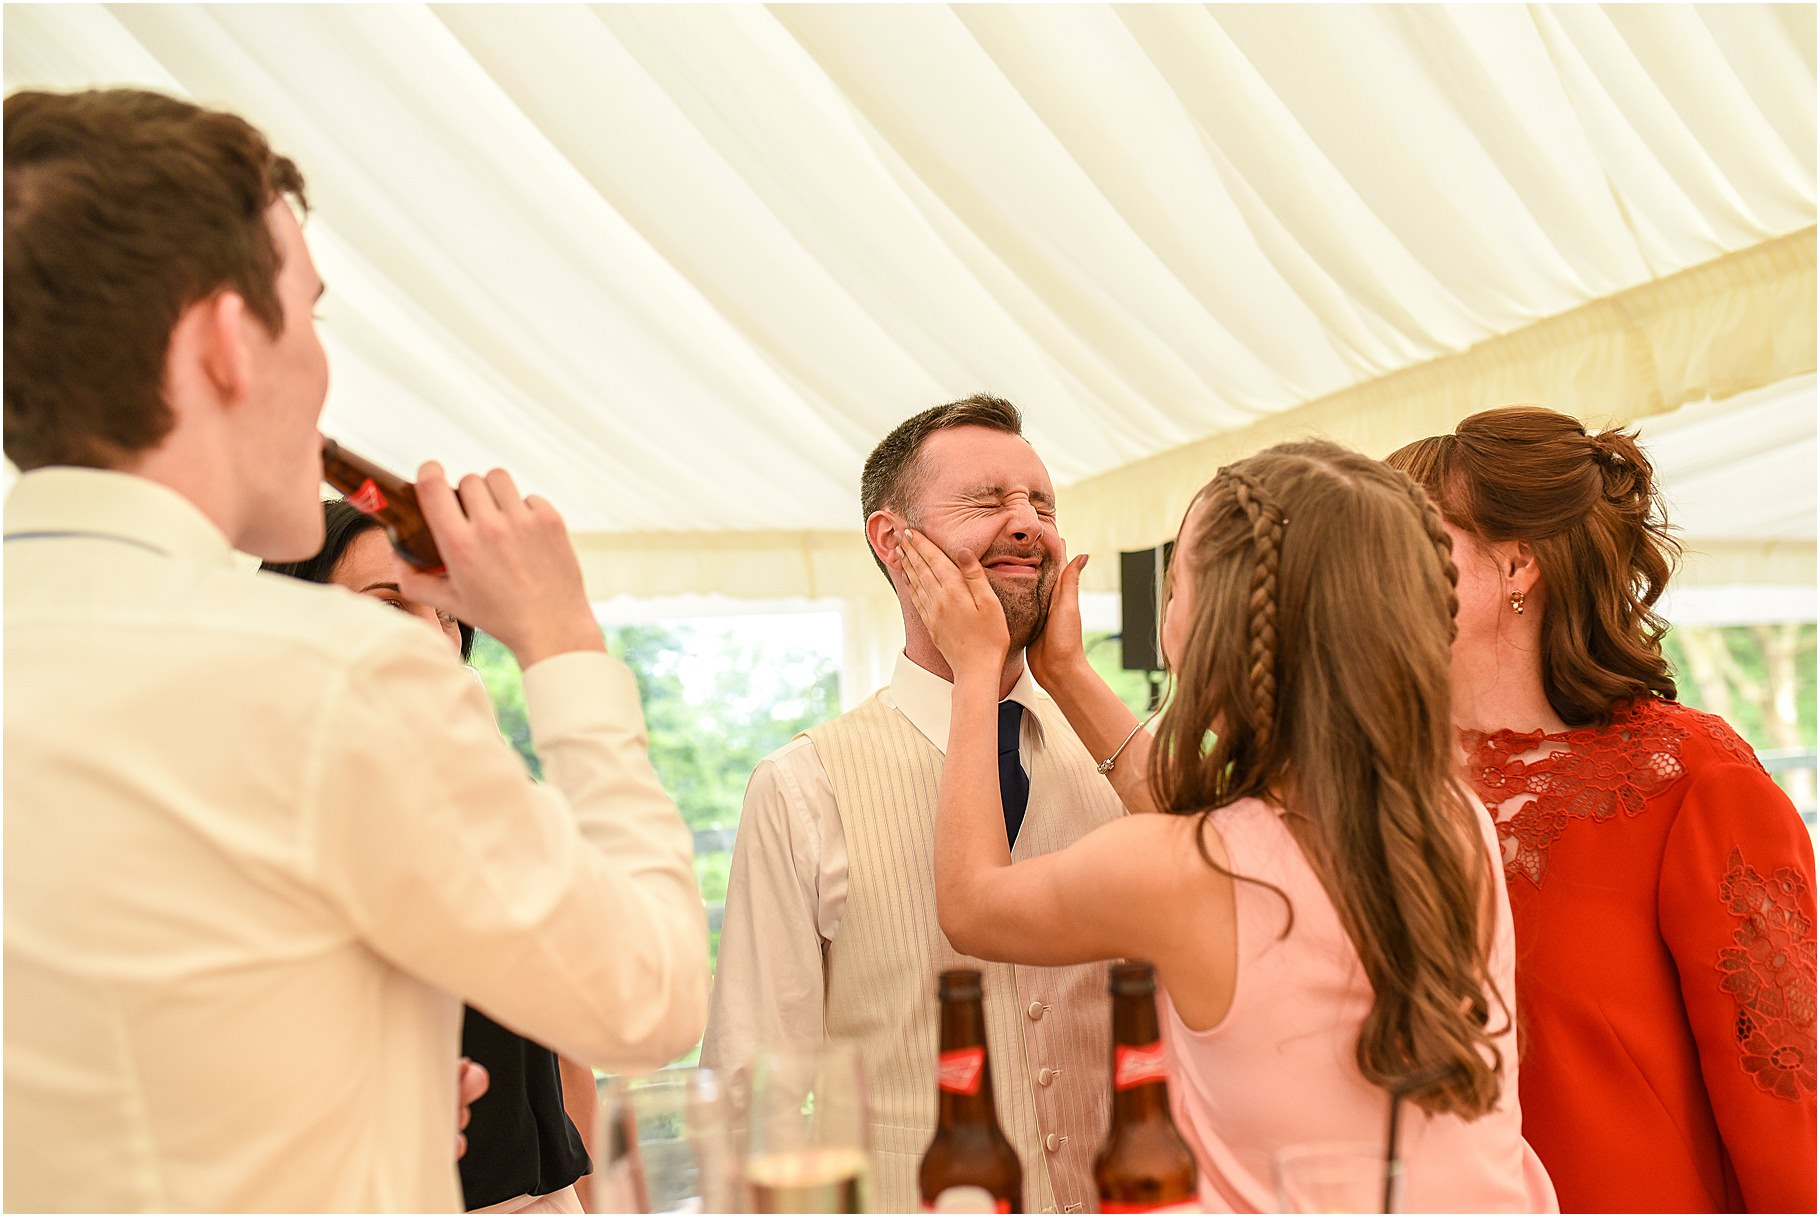 dan-wootton-photography-2017-weddings-190.jpg